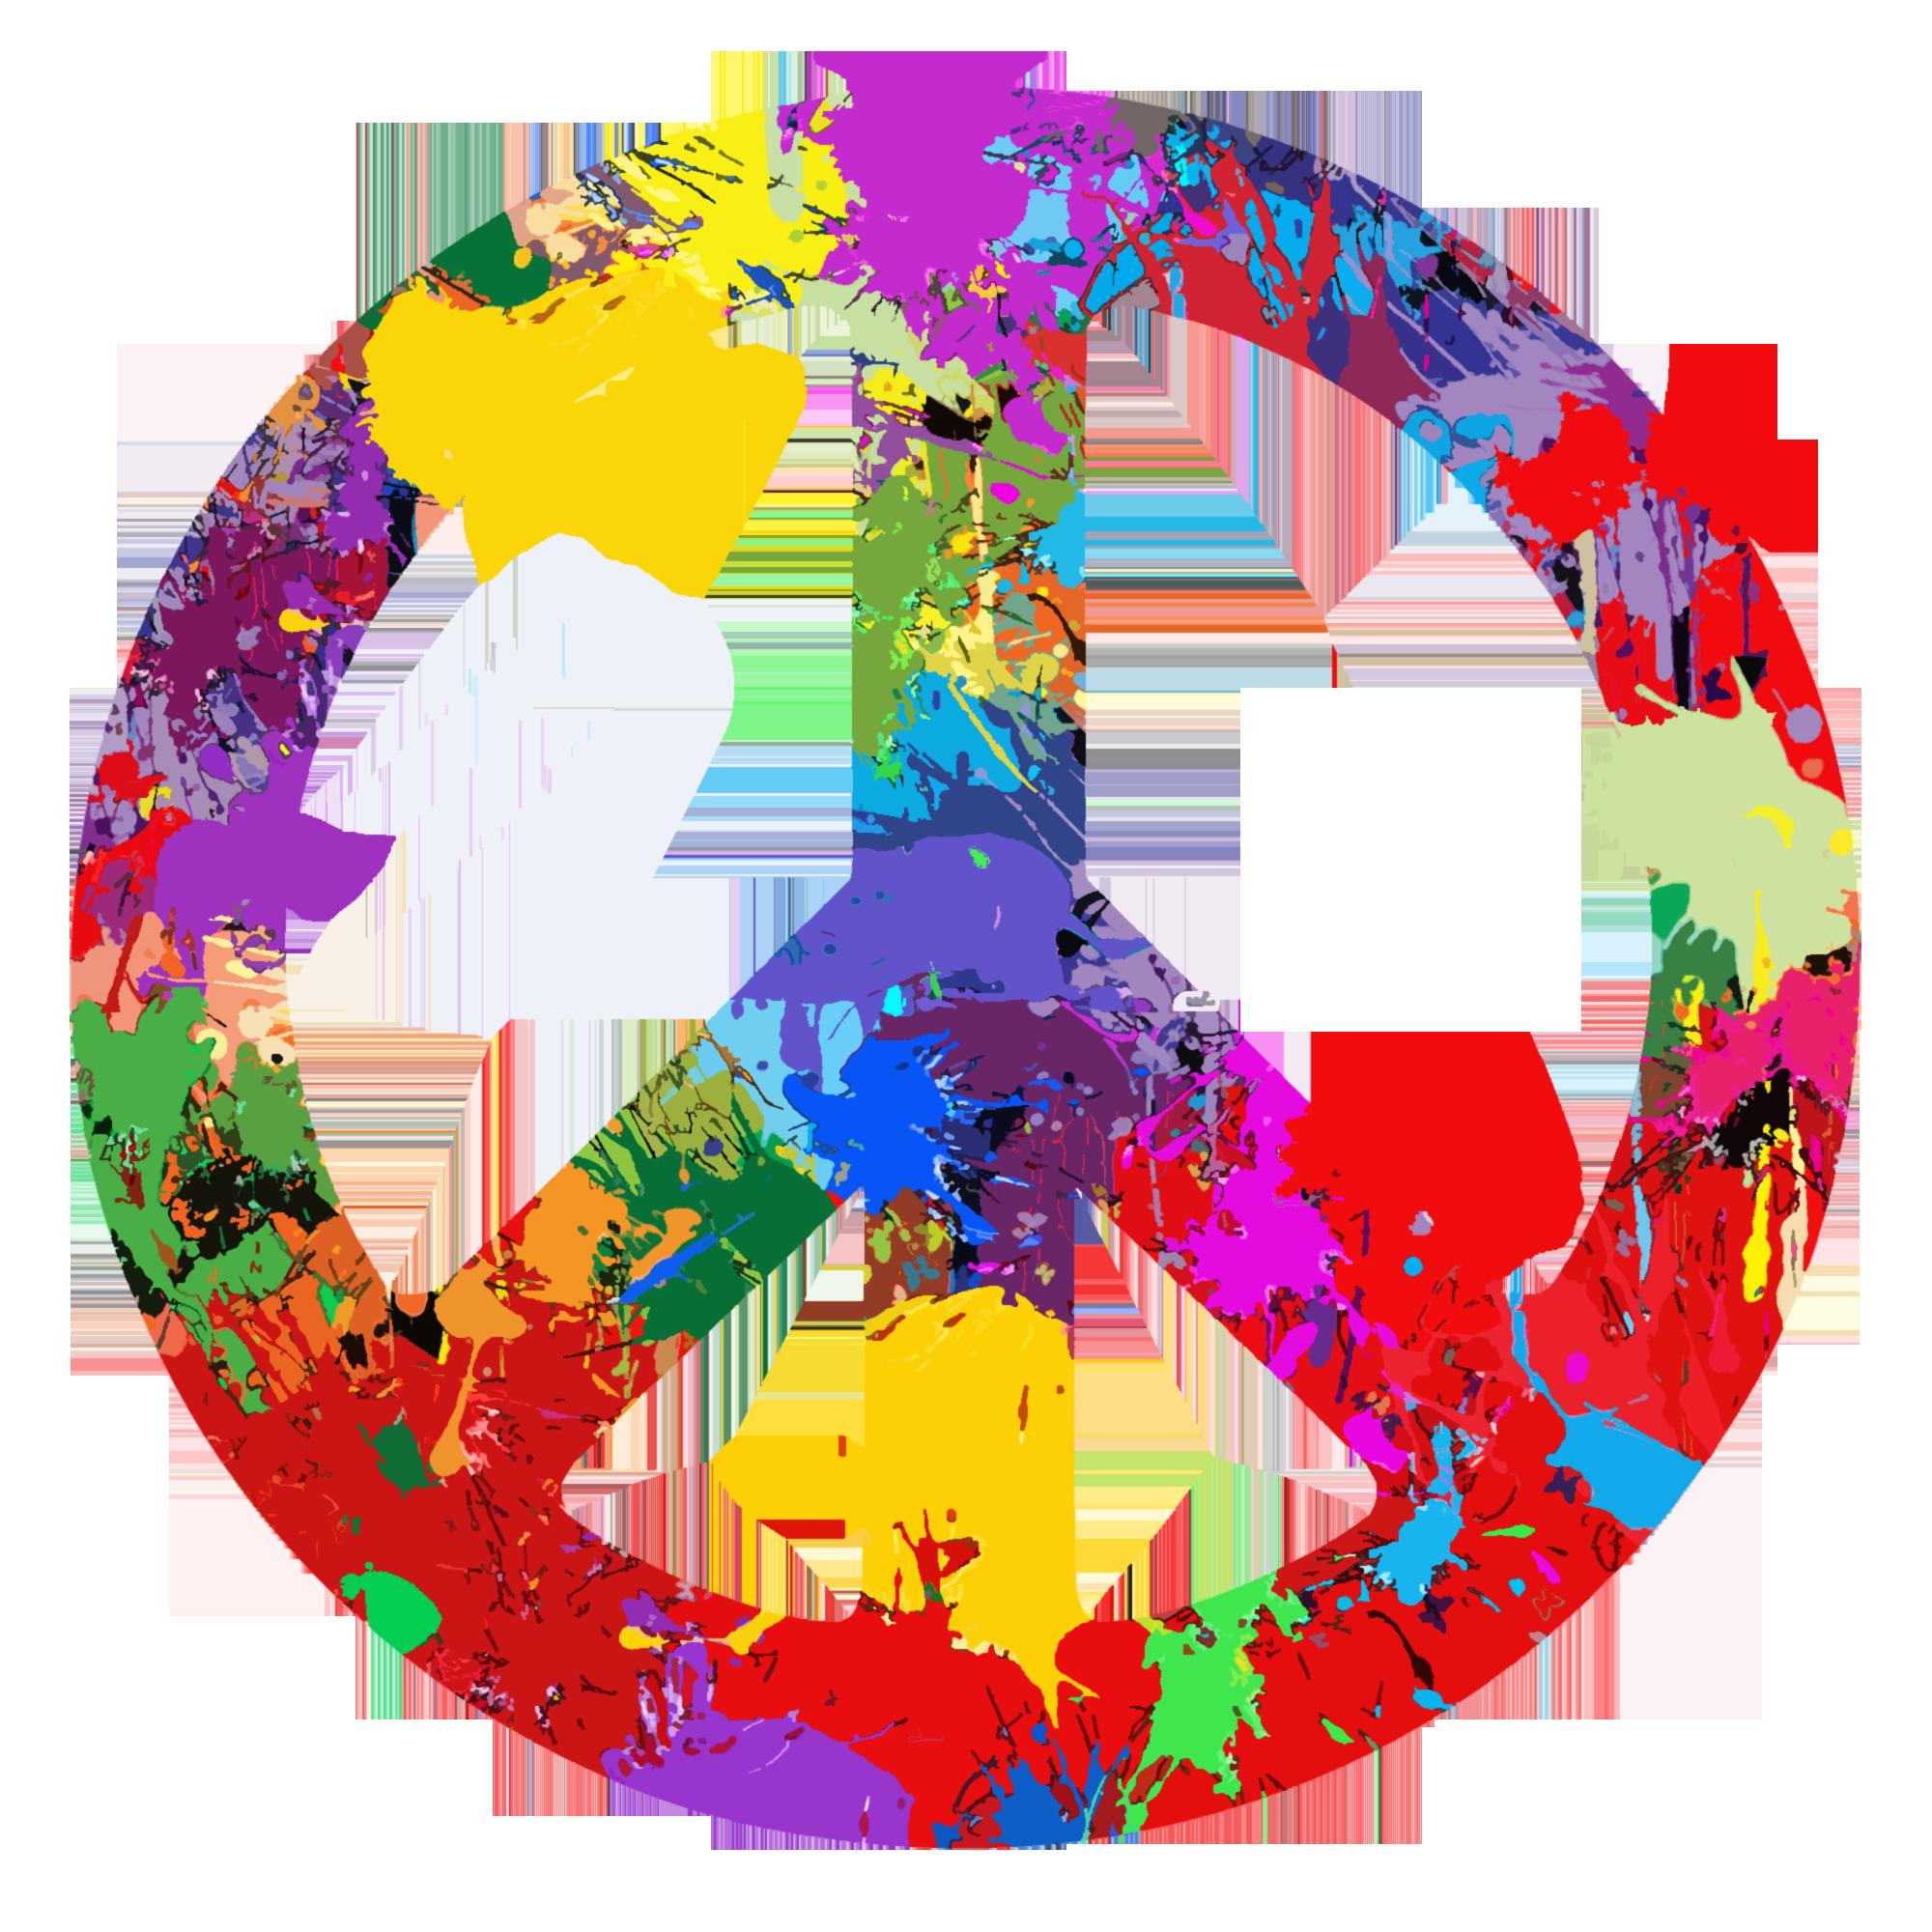 Paint splat peace symbol.